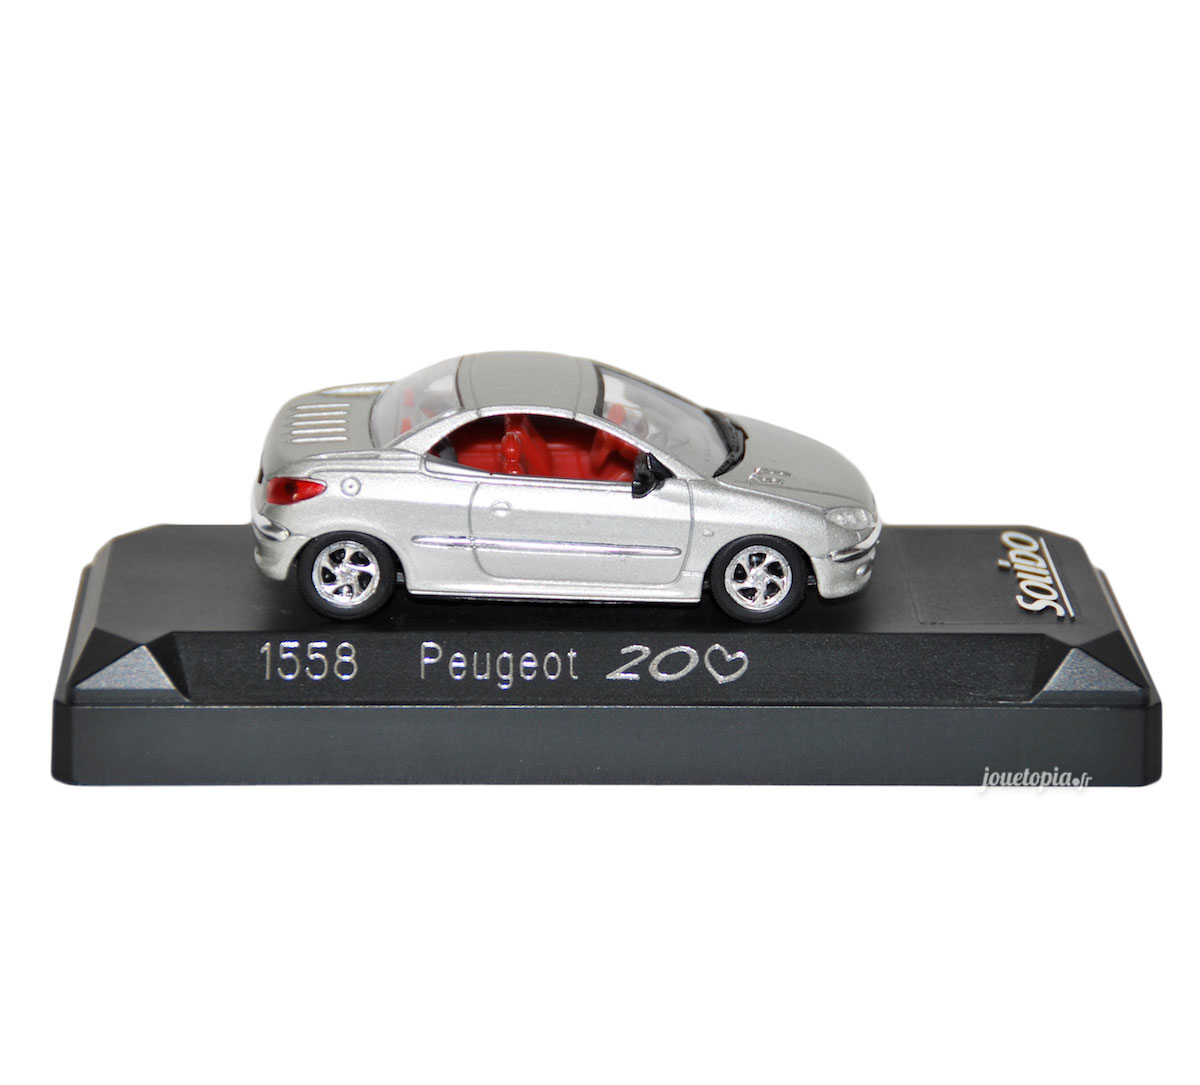 petite voiture peugeot 206 cc miniature solido 1 43 jou topia. Black Bedroom Furniture Sets. Home Design Ideas